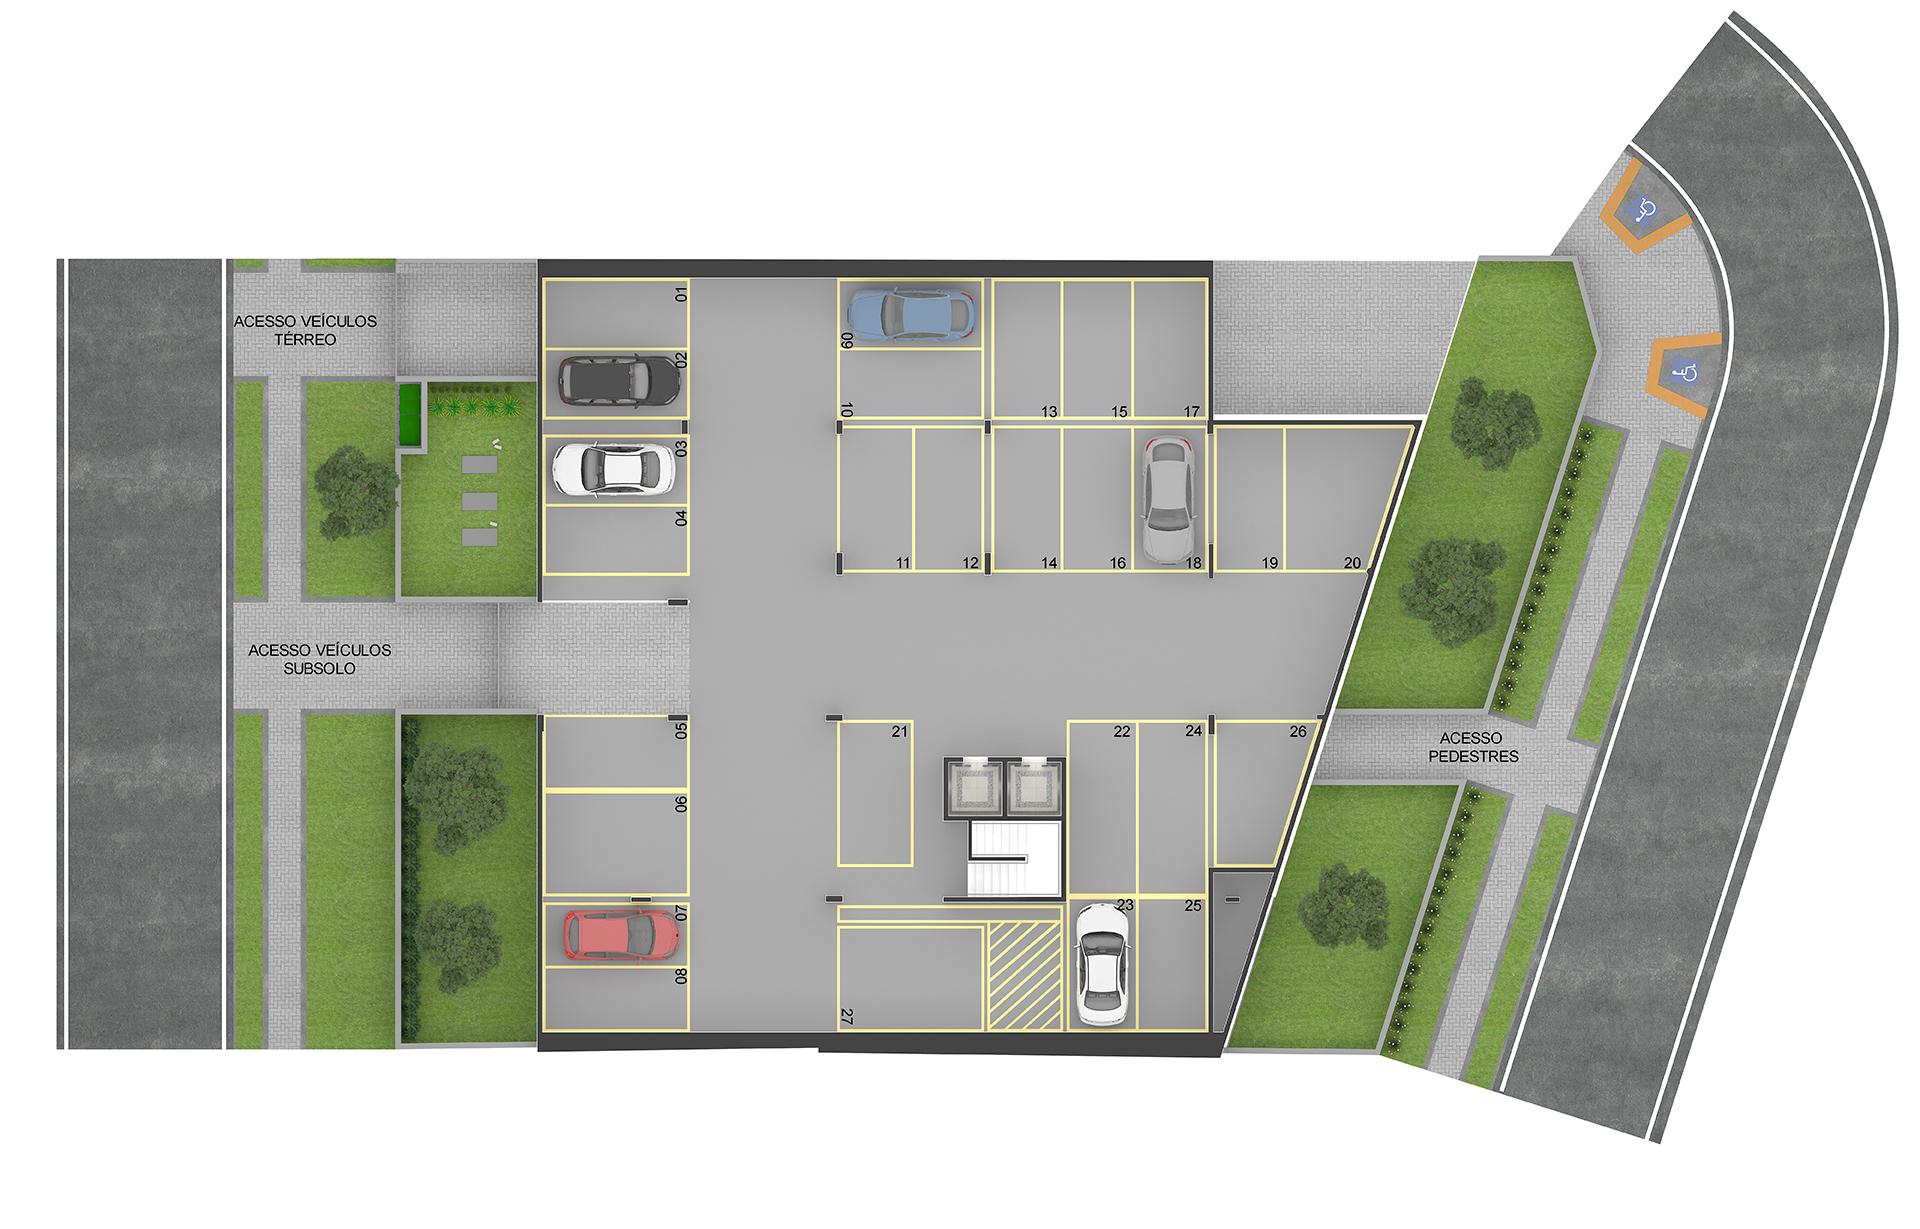 FyrStudio-Silicon-Savanna-Planta-Pavimento Subsolo-FINAL